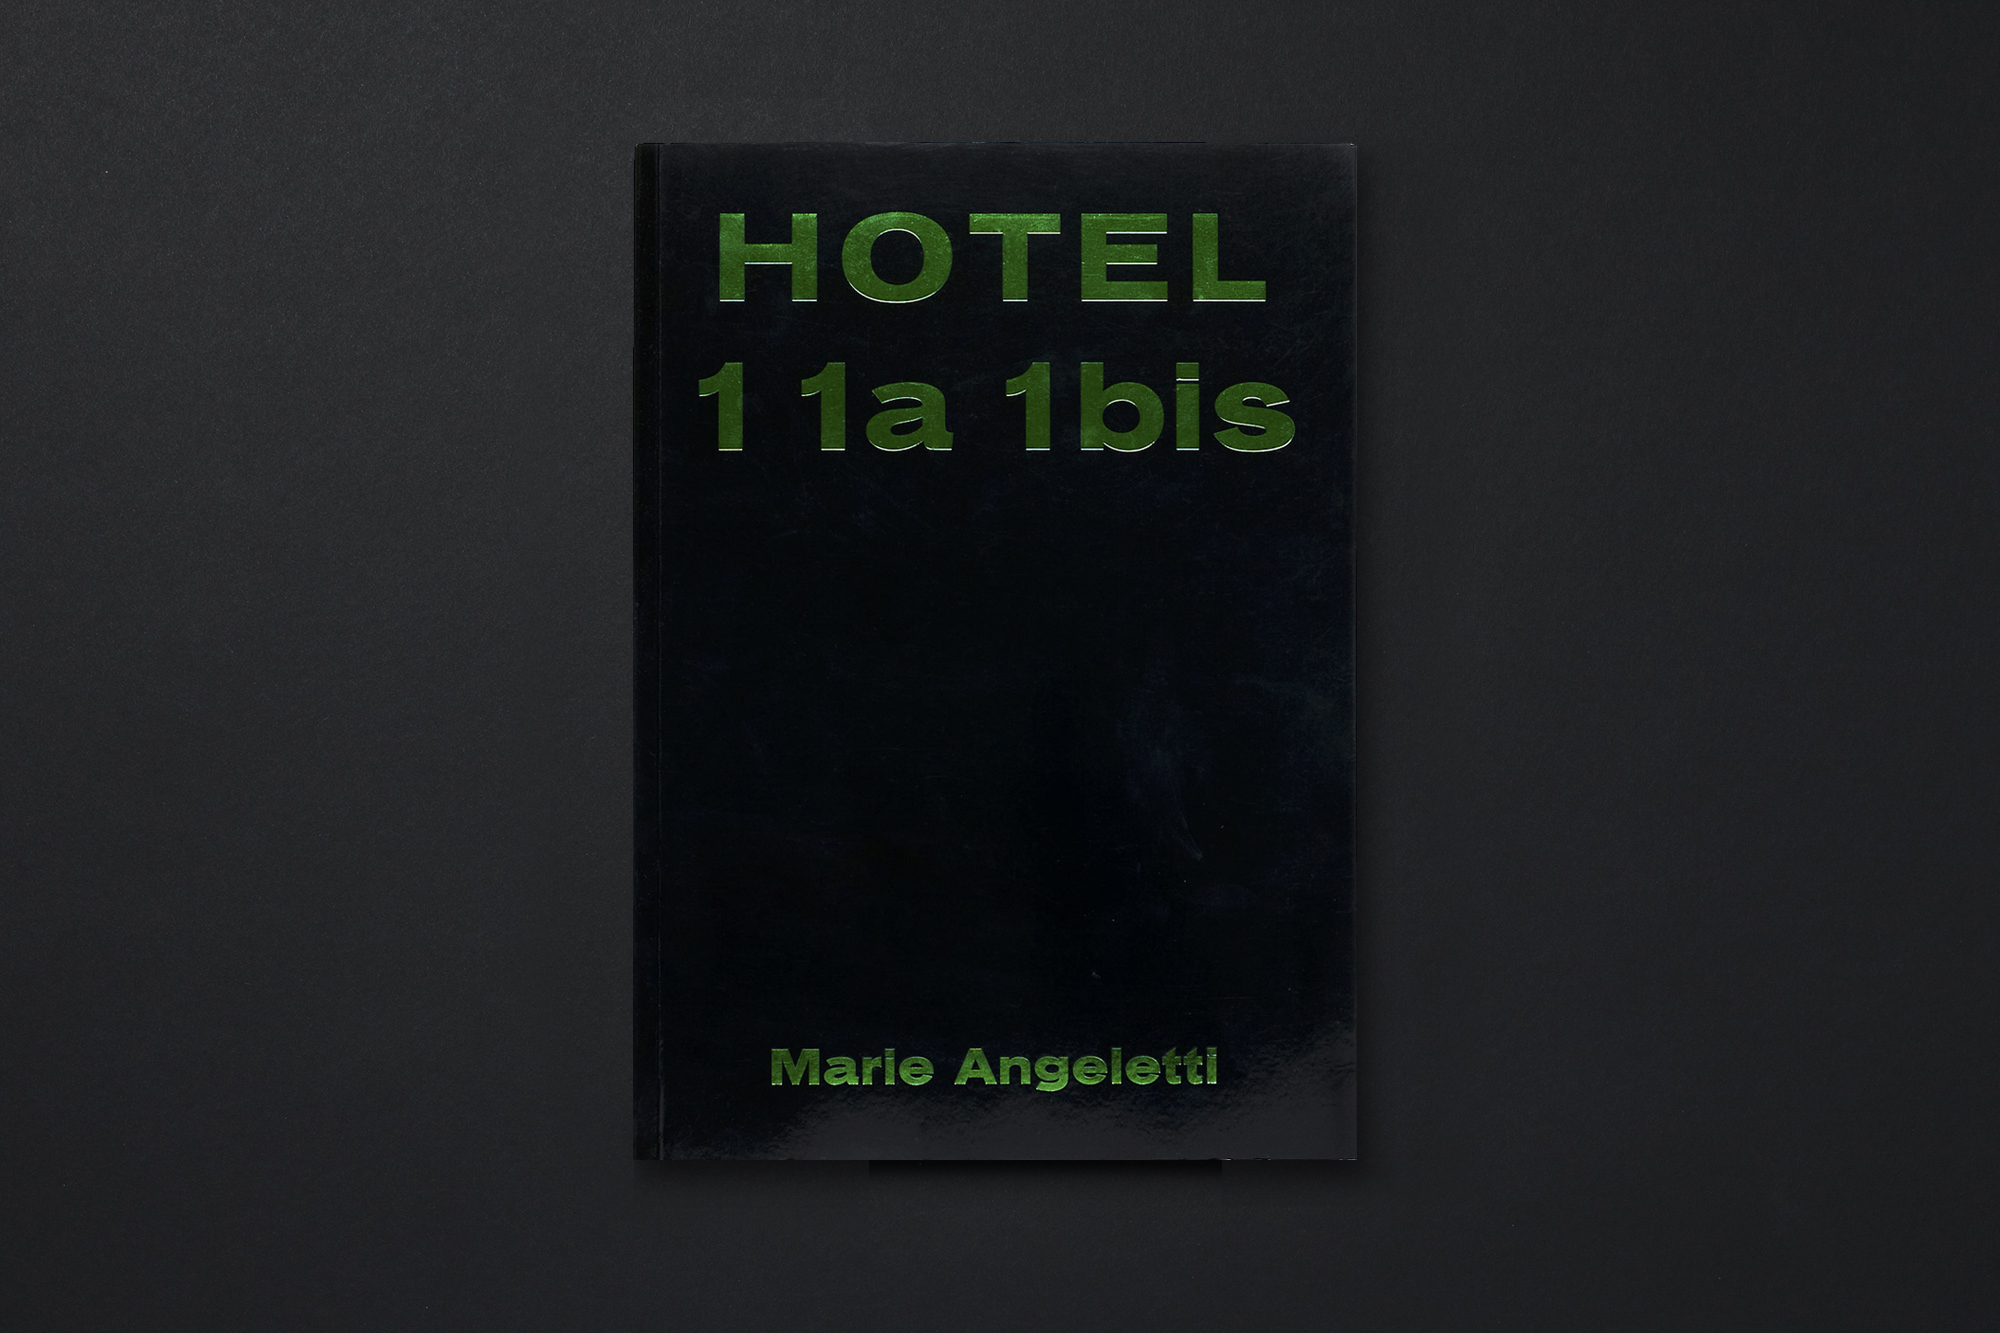 Hotel 1 1a 1bis, Marie Angeletti